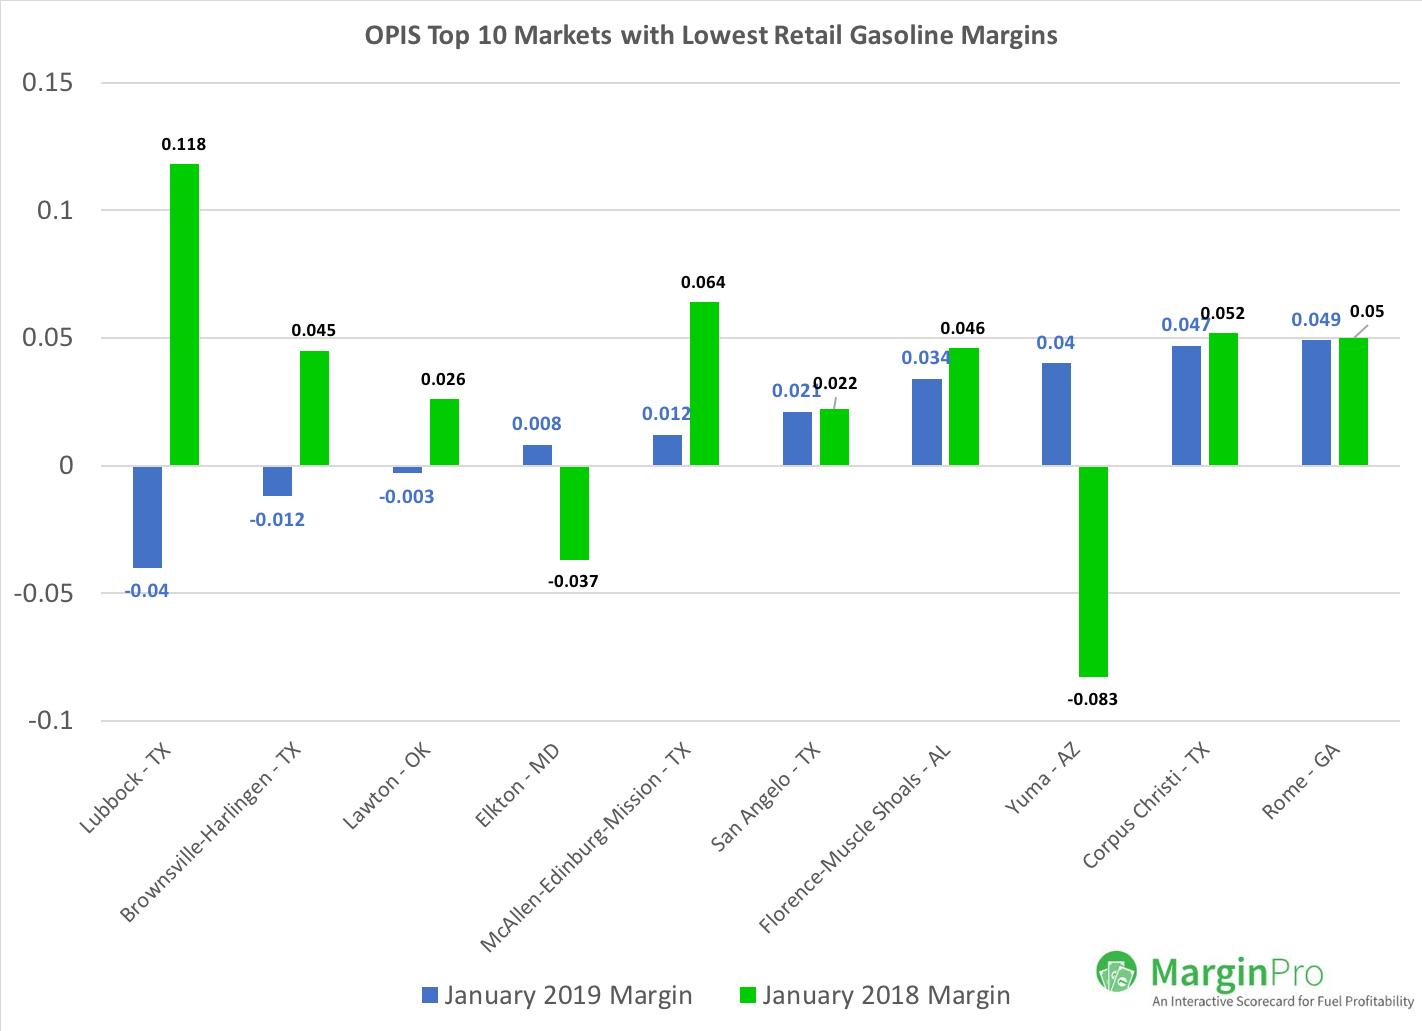 Bottom 10 Gasoline Markets